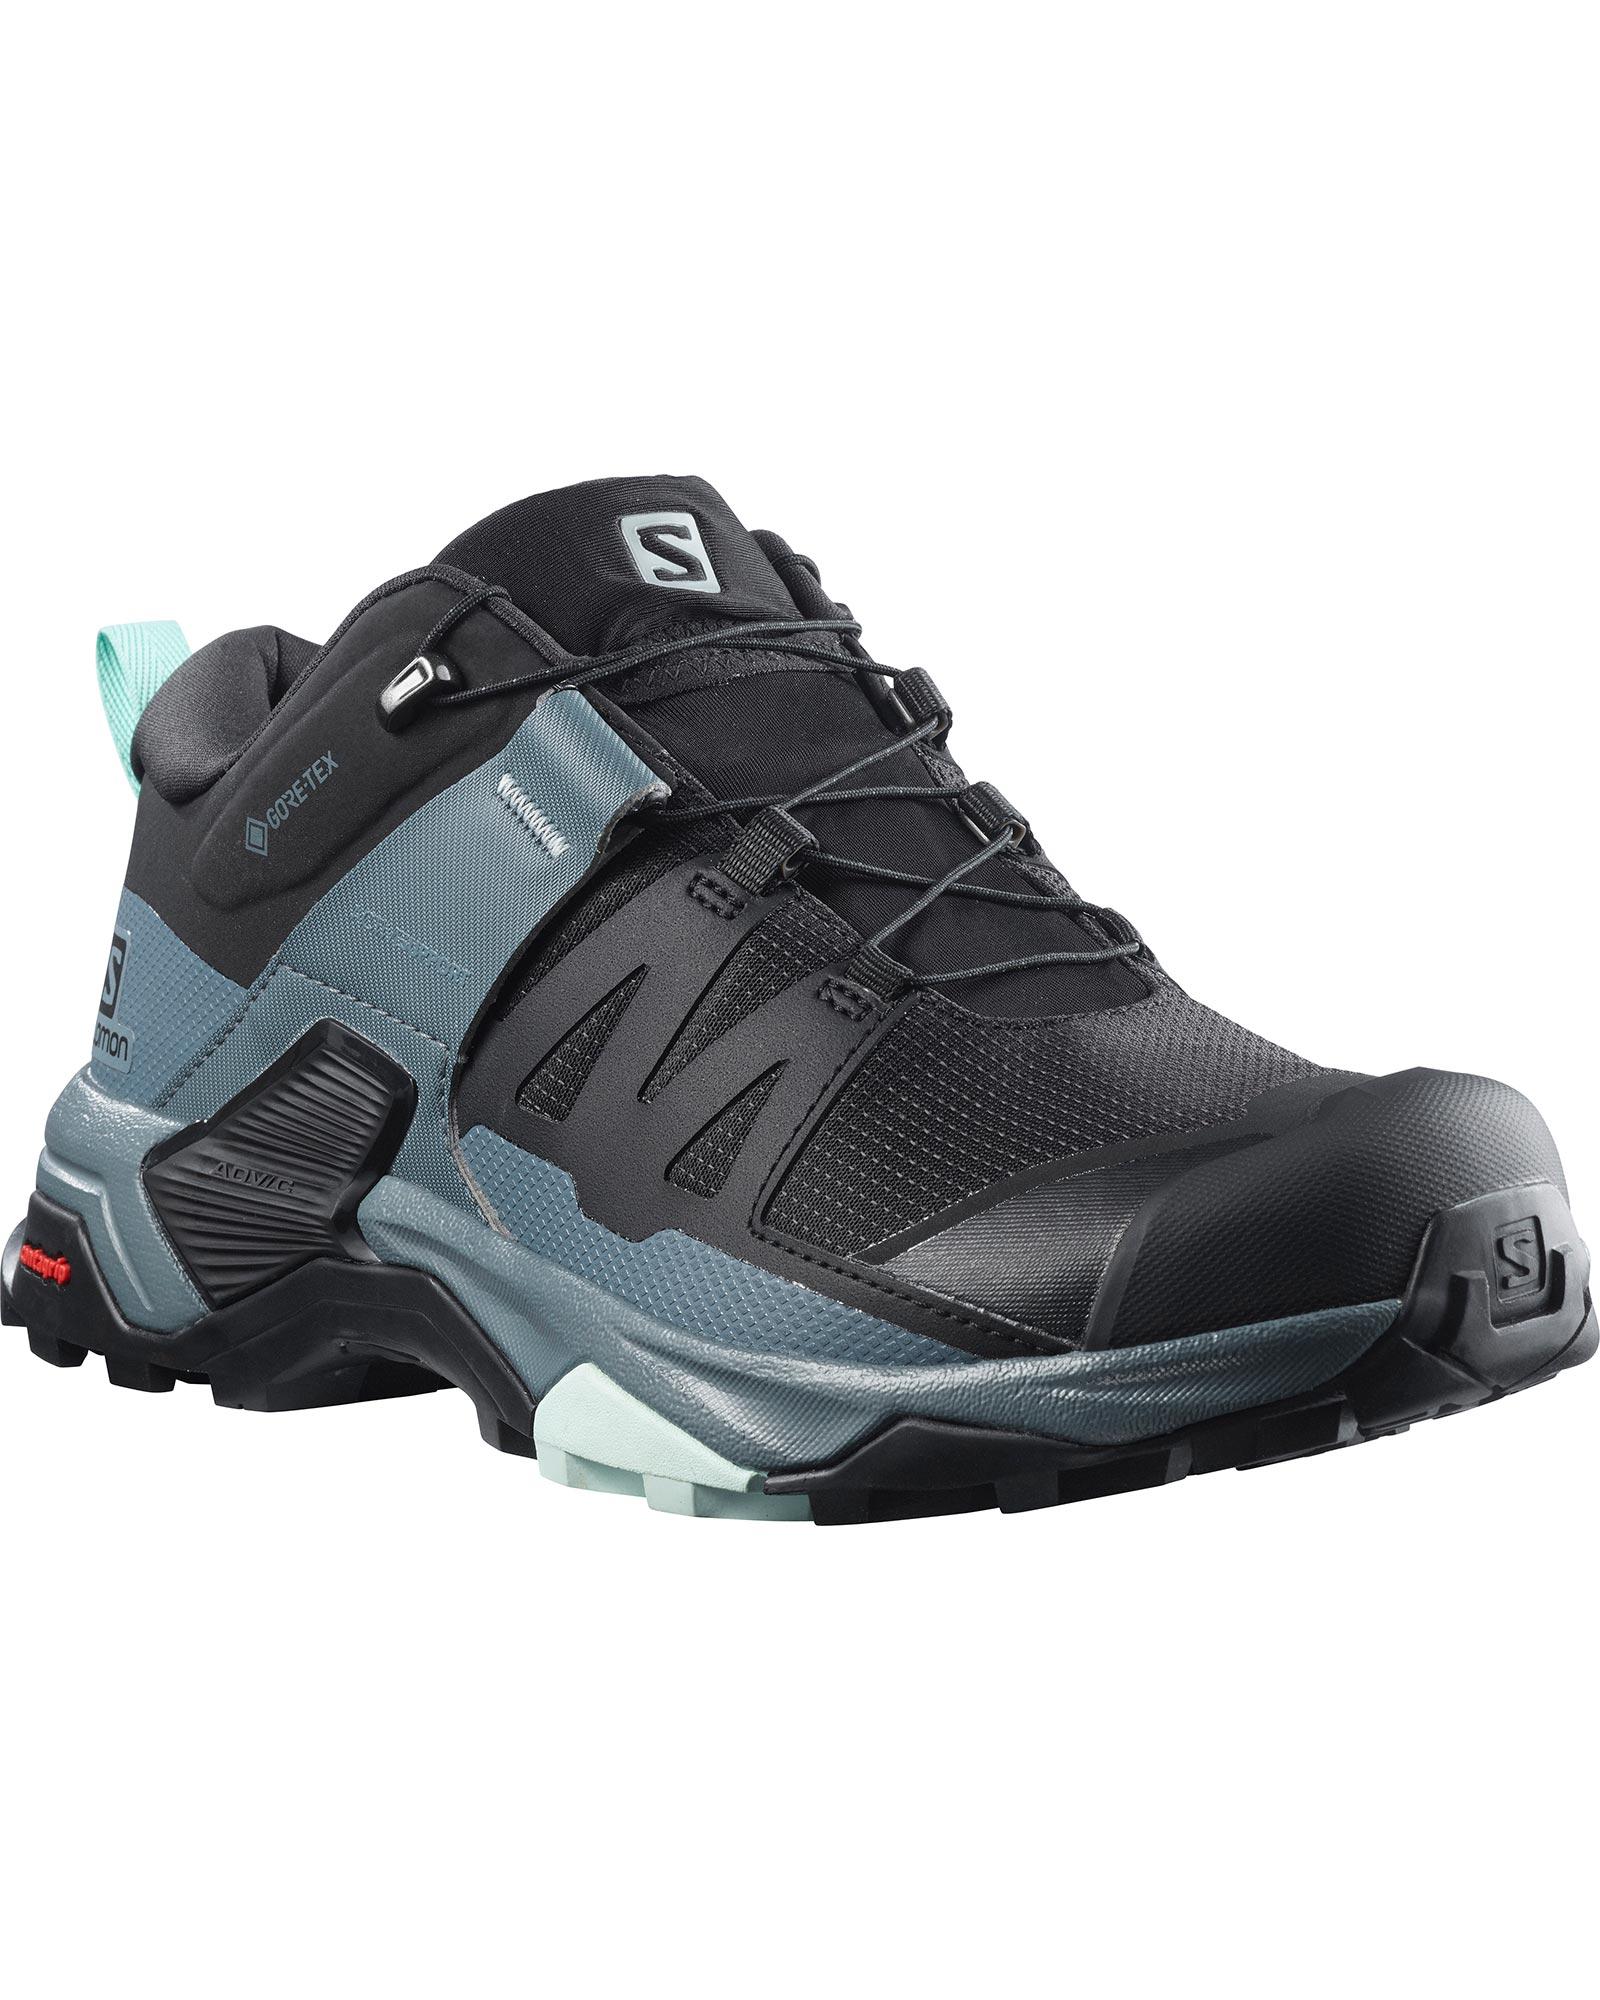 Salomon X Ultra 4 GORE-TEX Women's Shoes 0